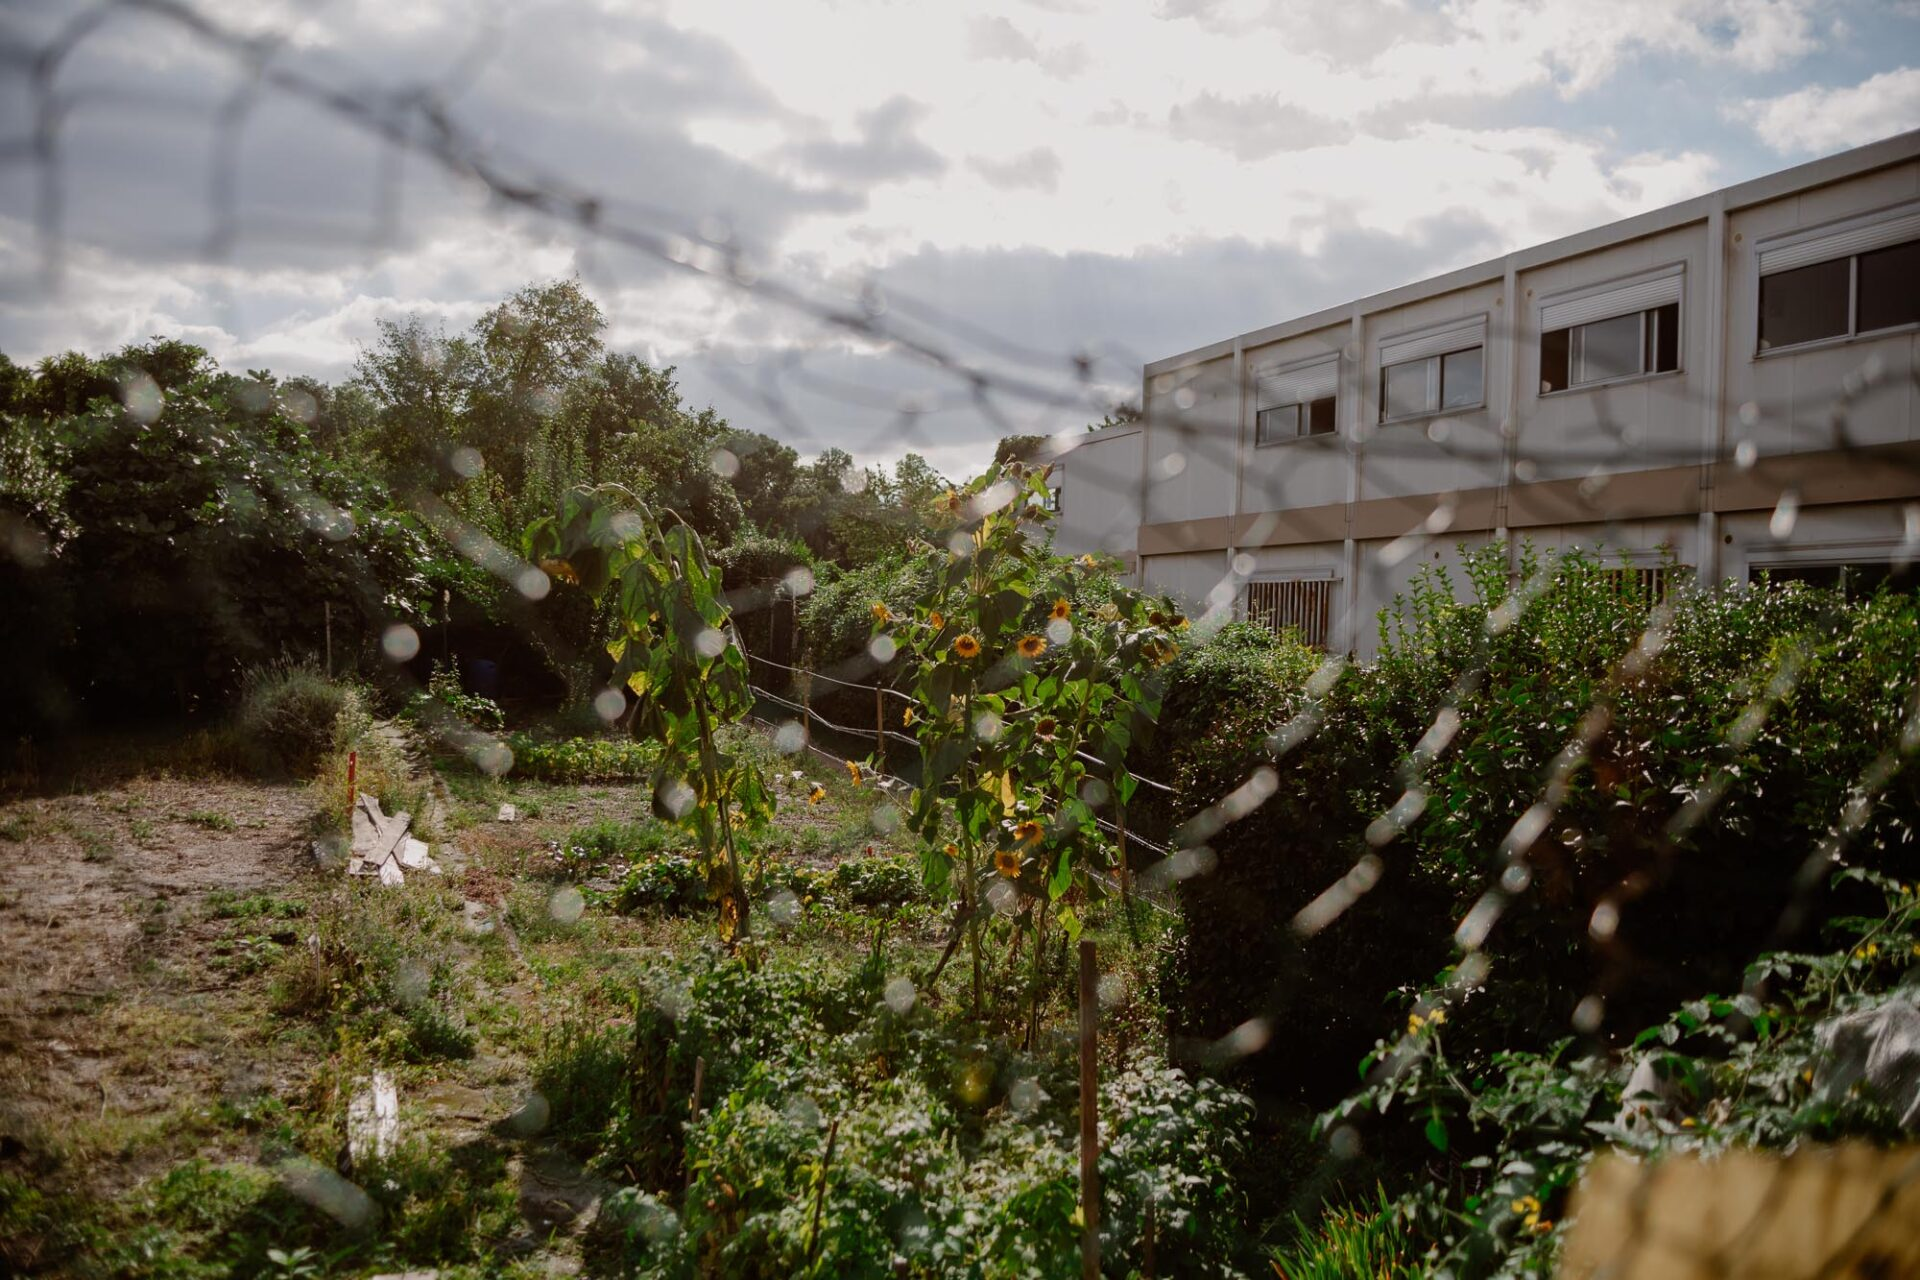 Jardins ouvriers aubervilliers 1 - Dagmara Bojenko - Eco-conscious Weddings, Births & Families